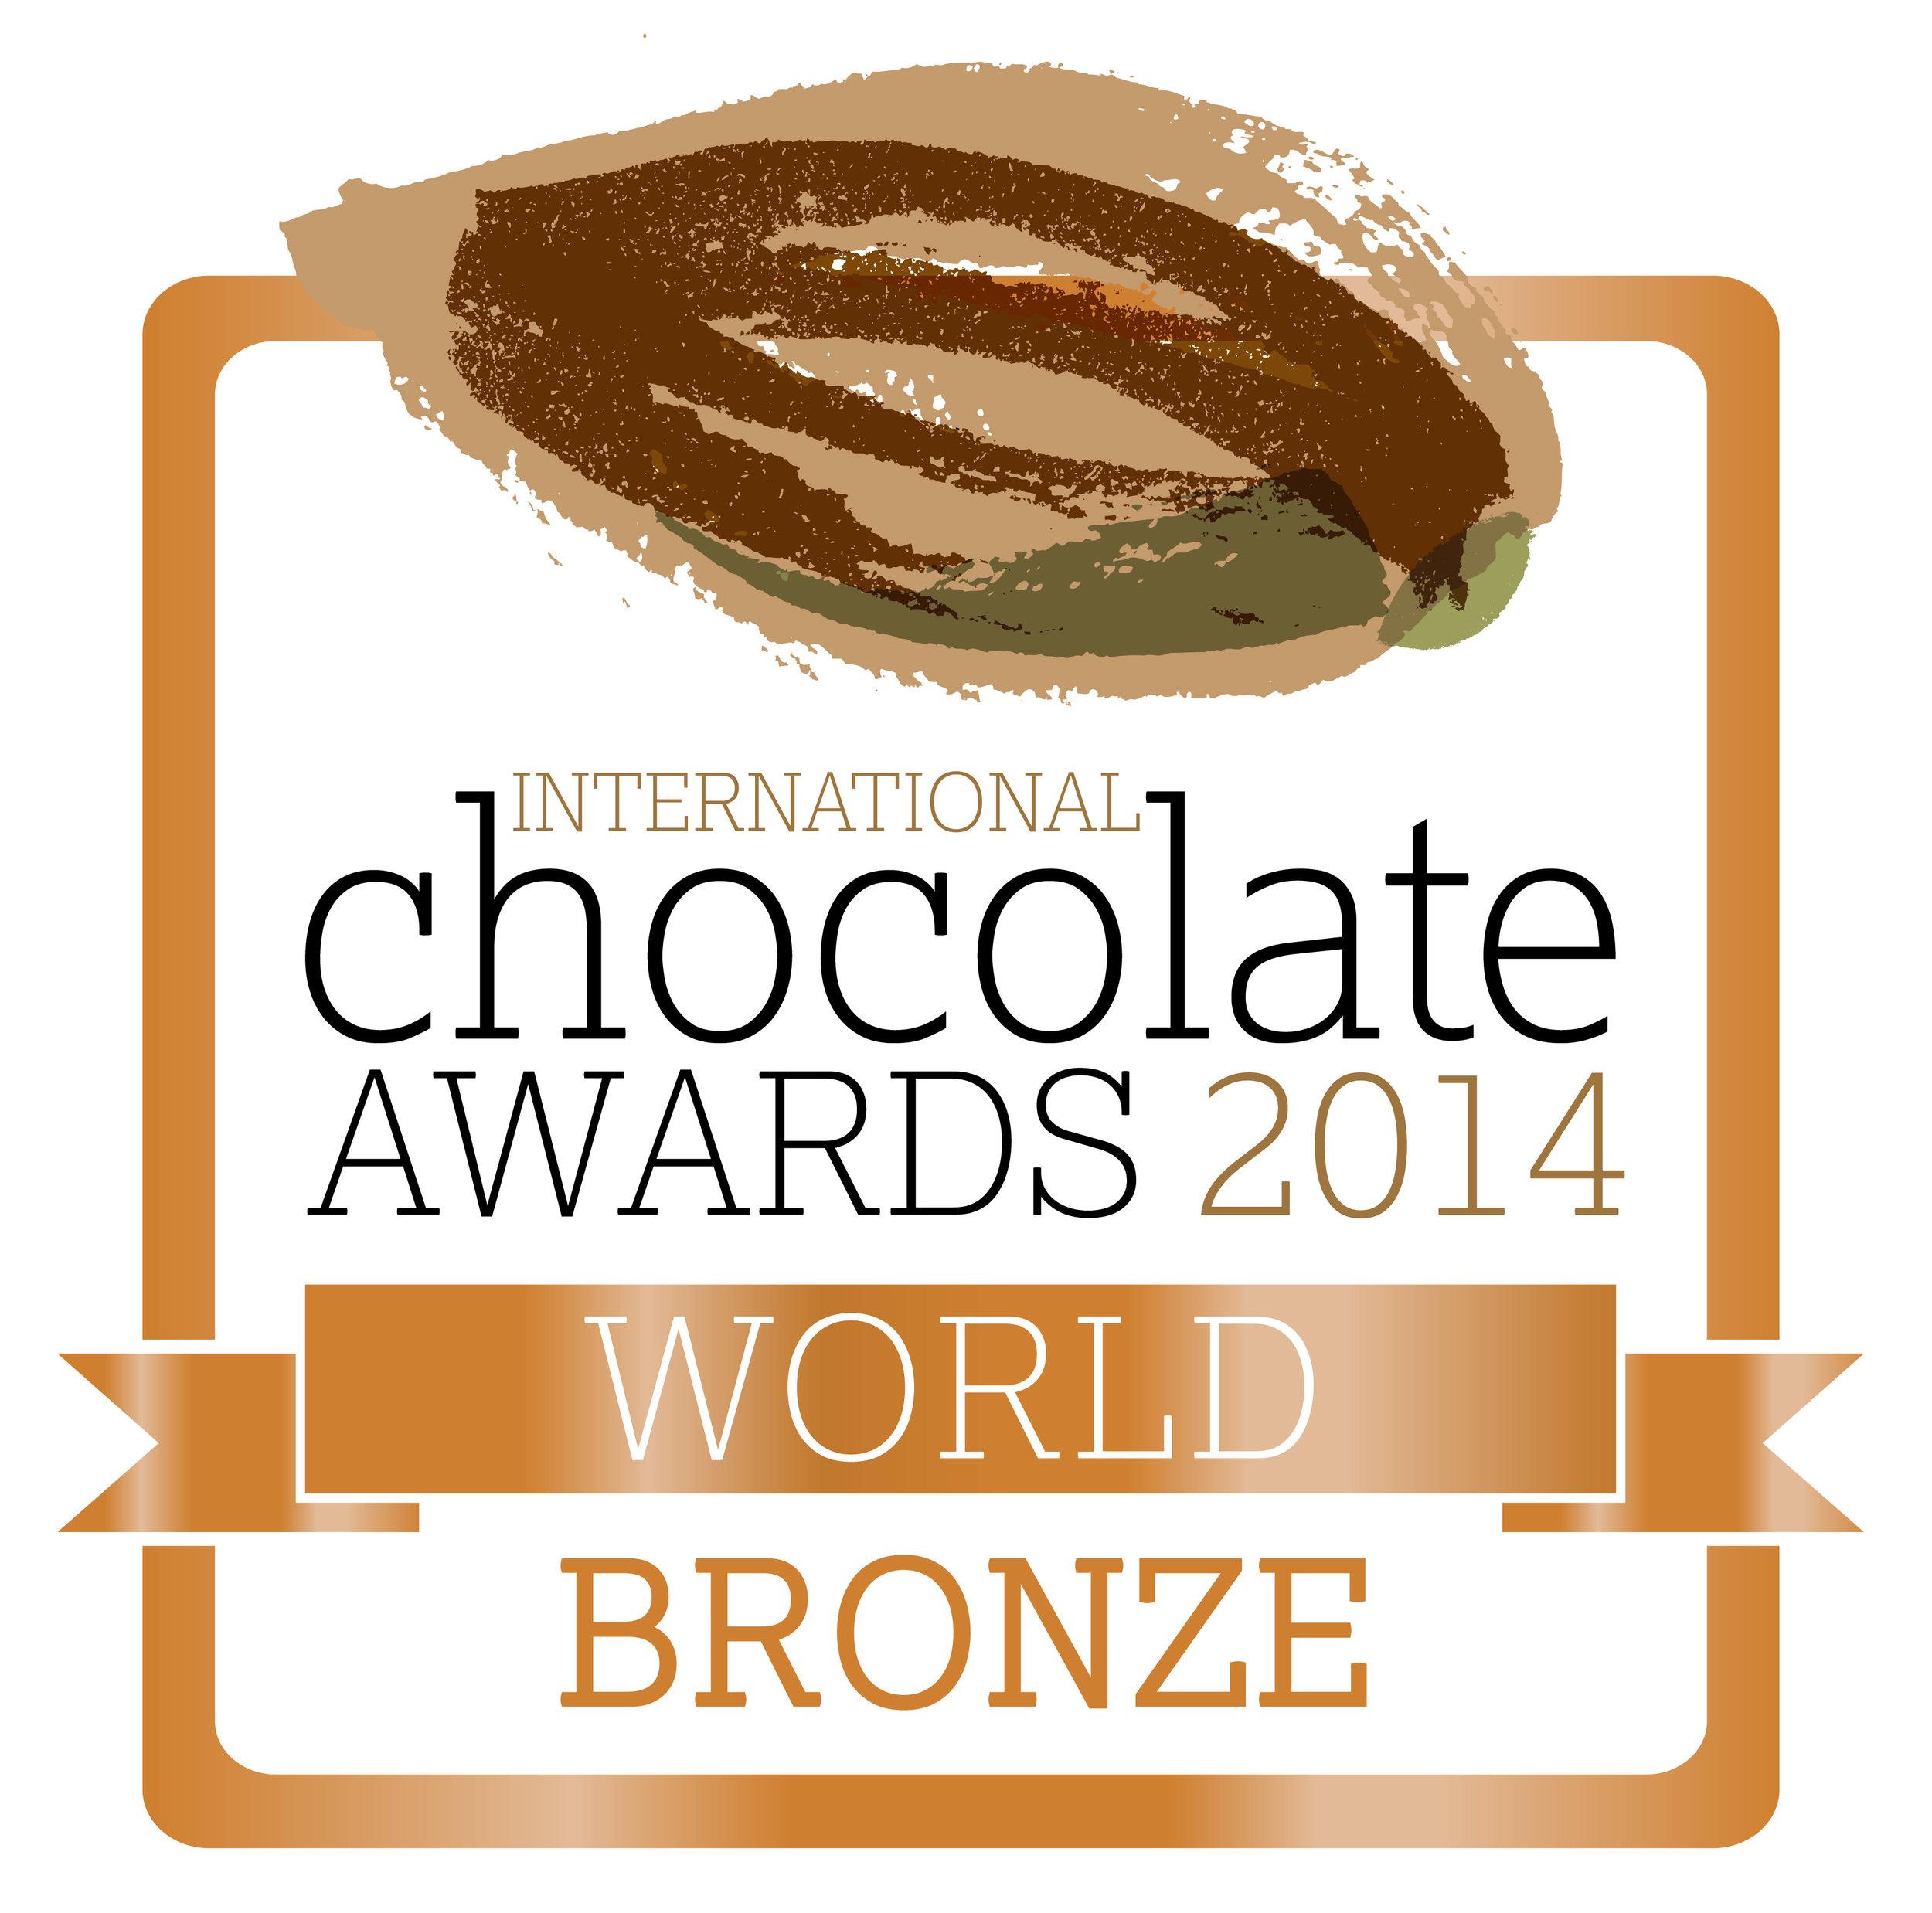 International Chocolate Awards World Bronze 2014